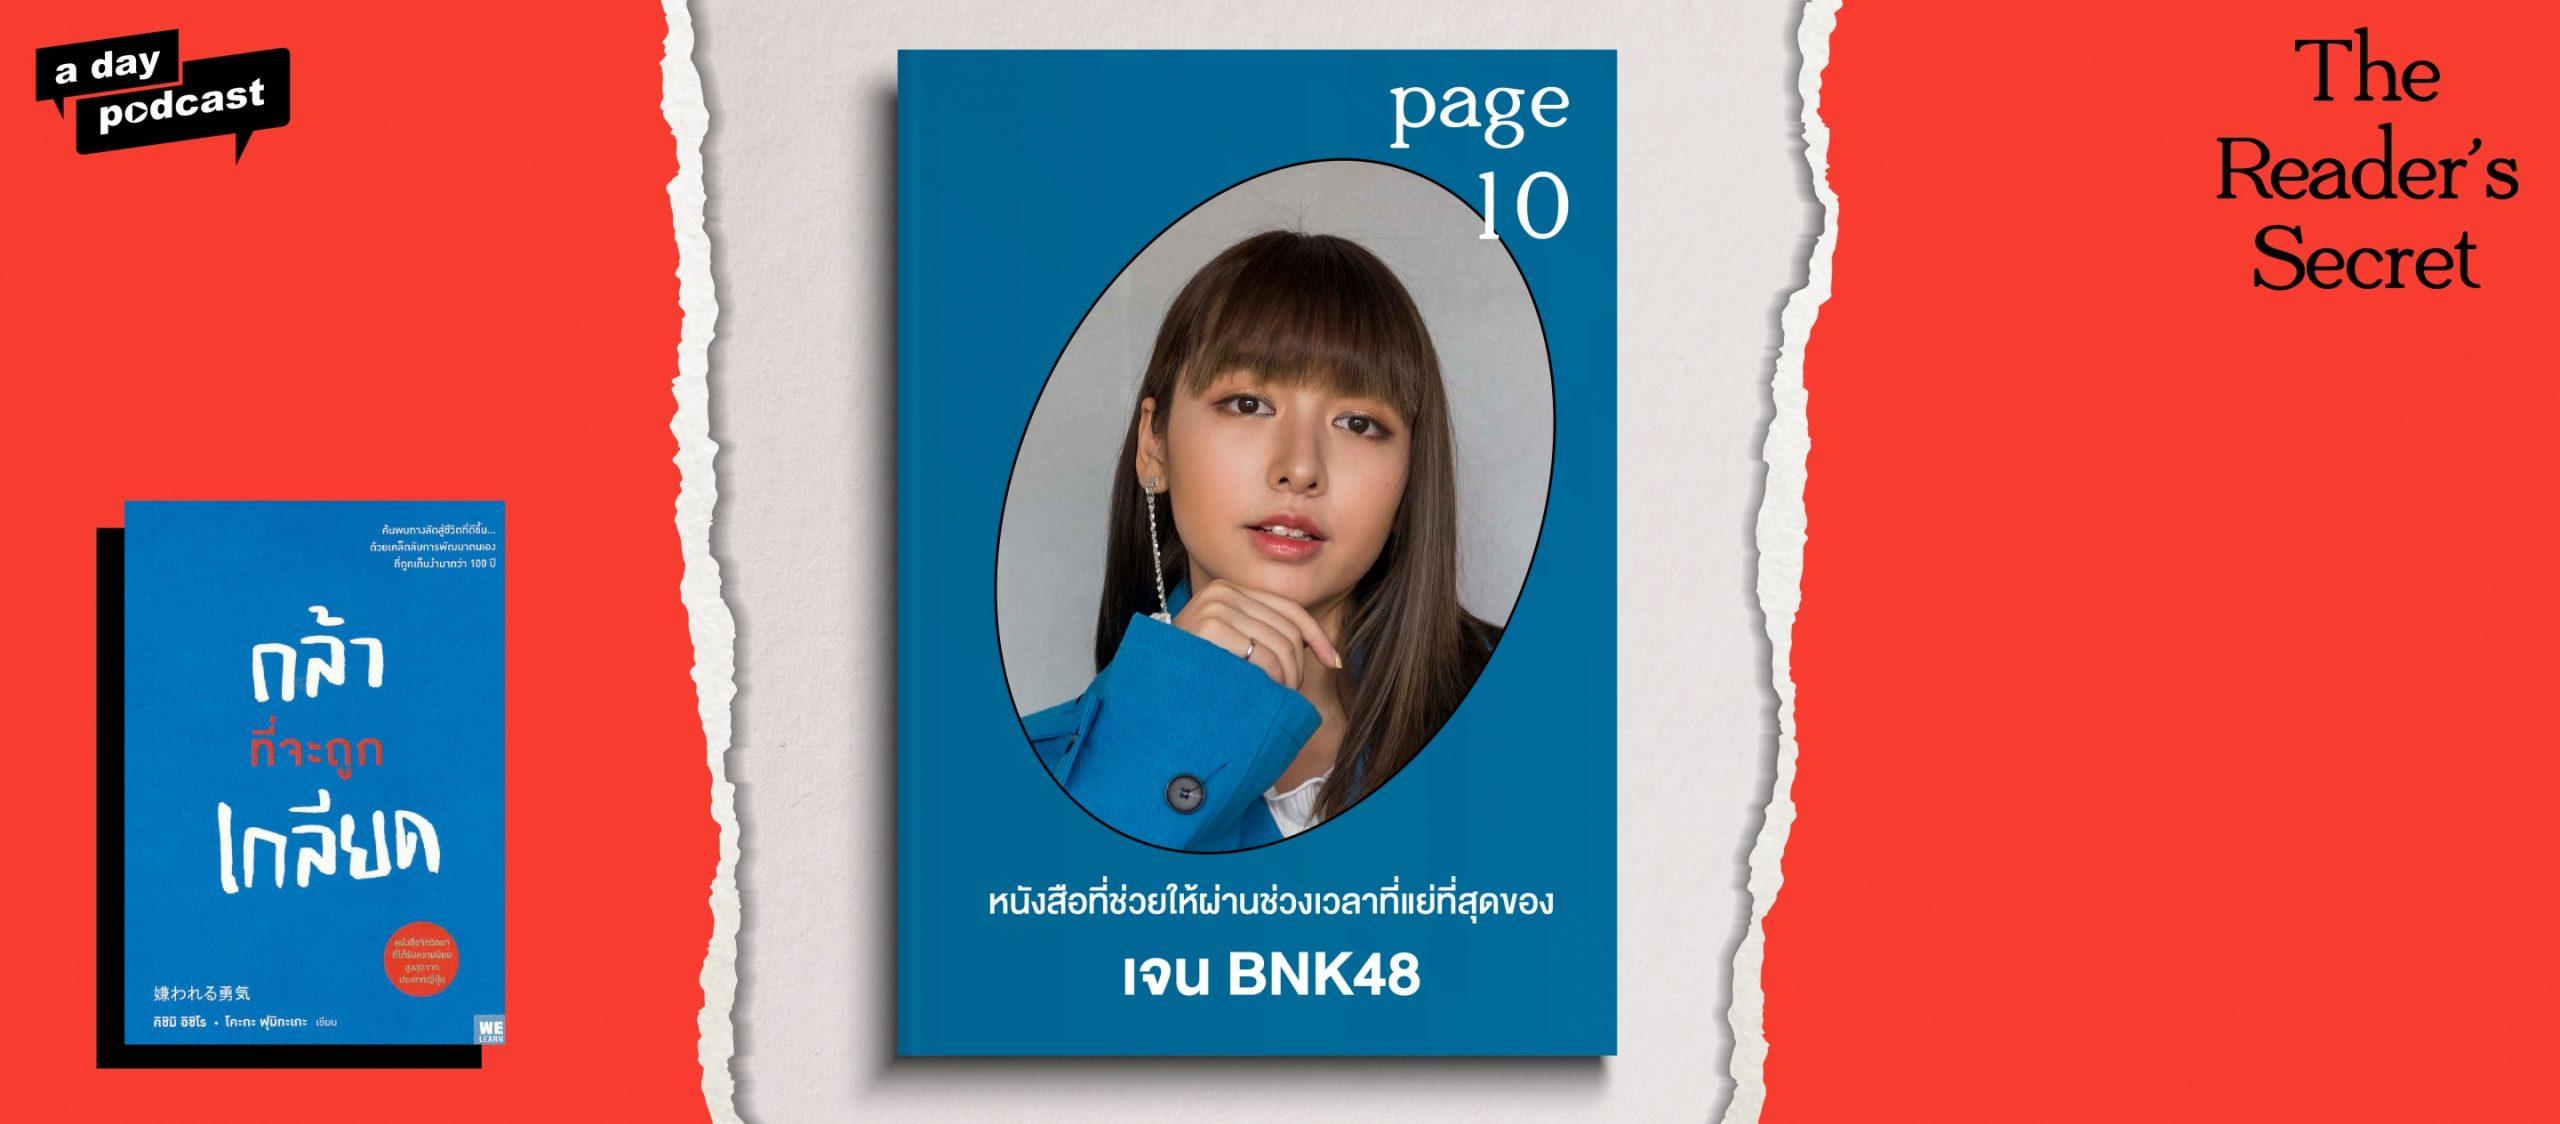 The Reader's Secret EP.10 หนังสือที่ช่วยให้ผ่านช่วงเวลาที่แย่ที่สุดของ เจน BNK48